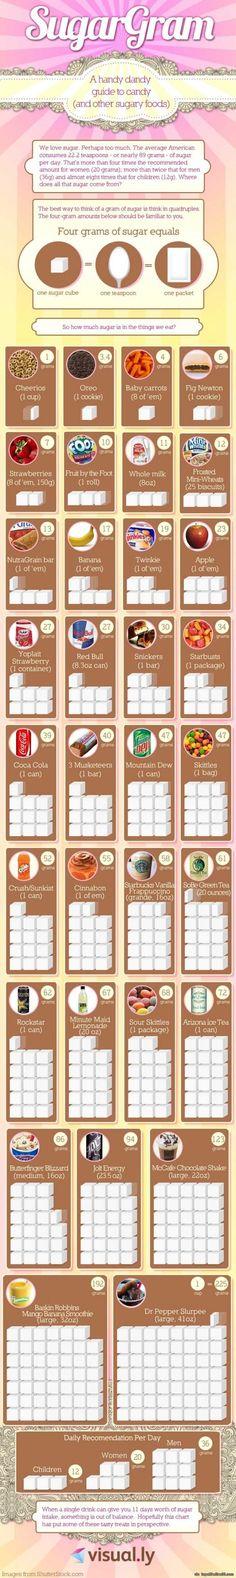 contenido de azúcar, en gramos, de alimentos